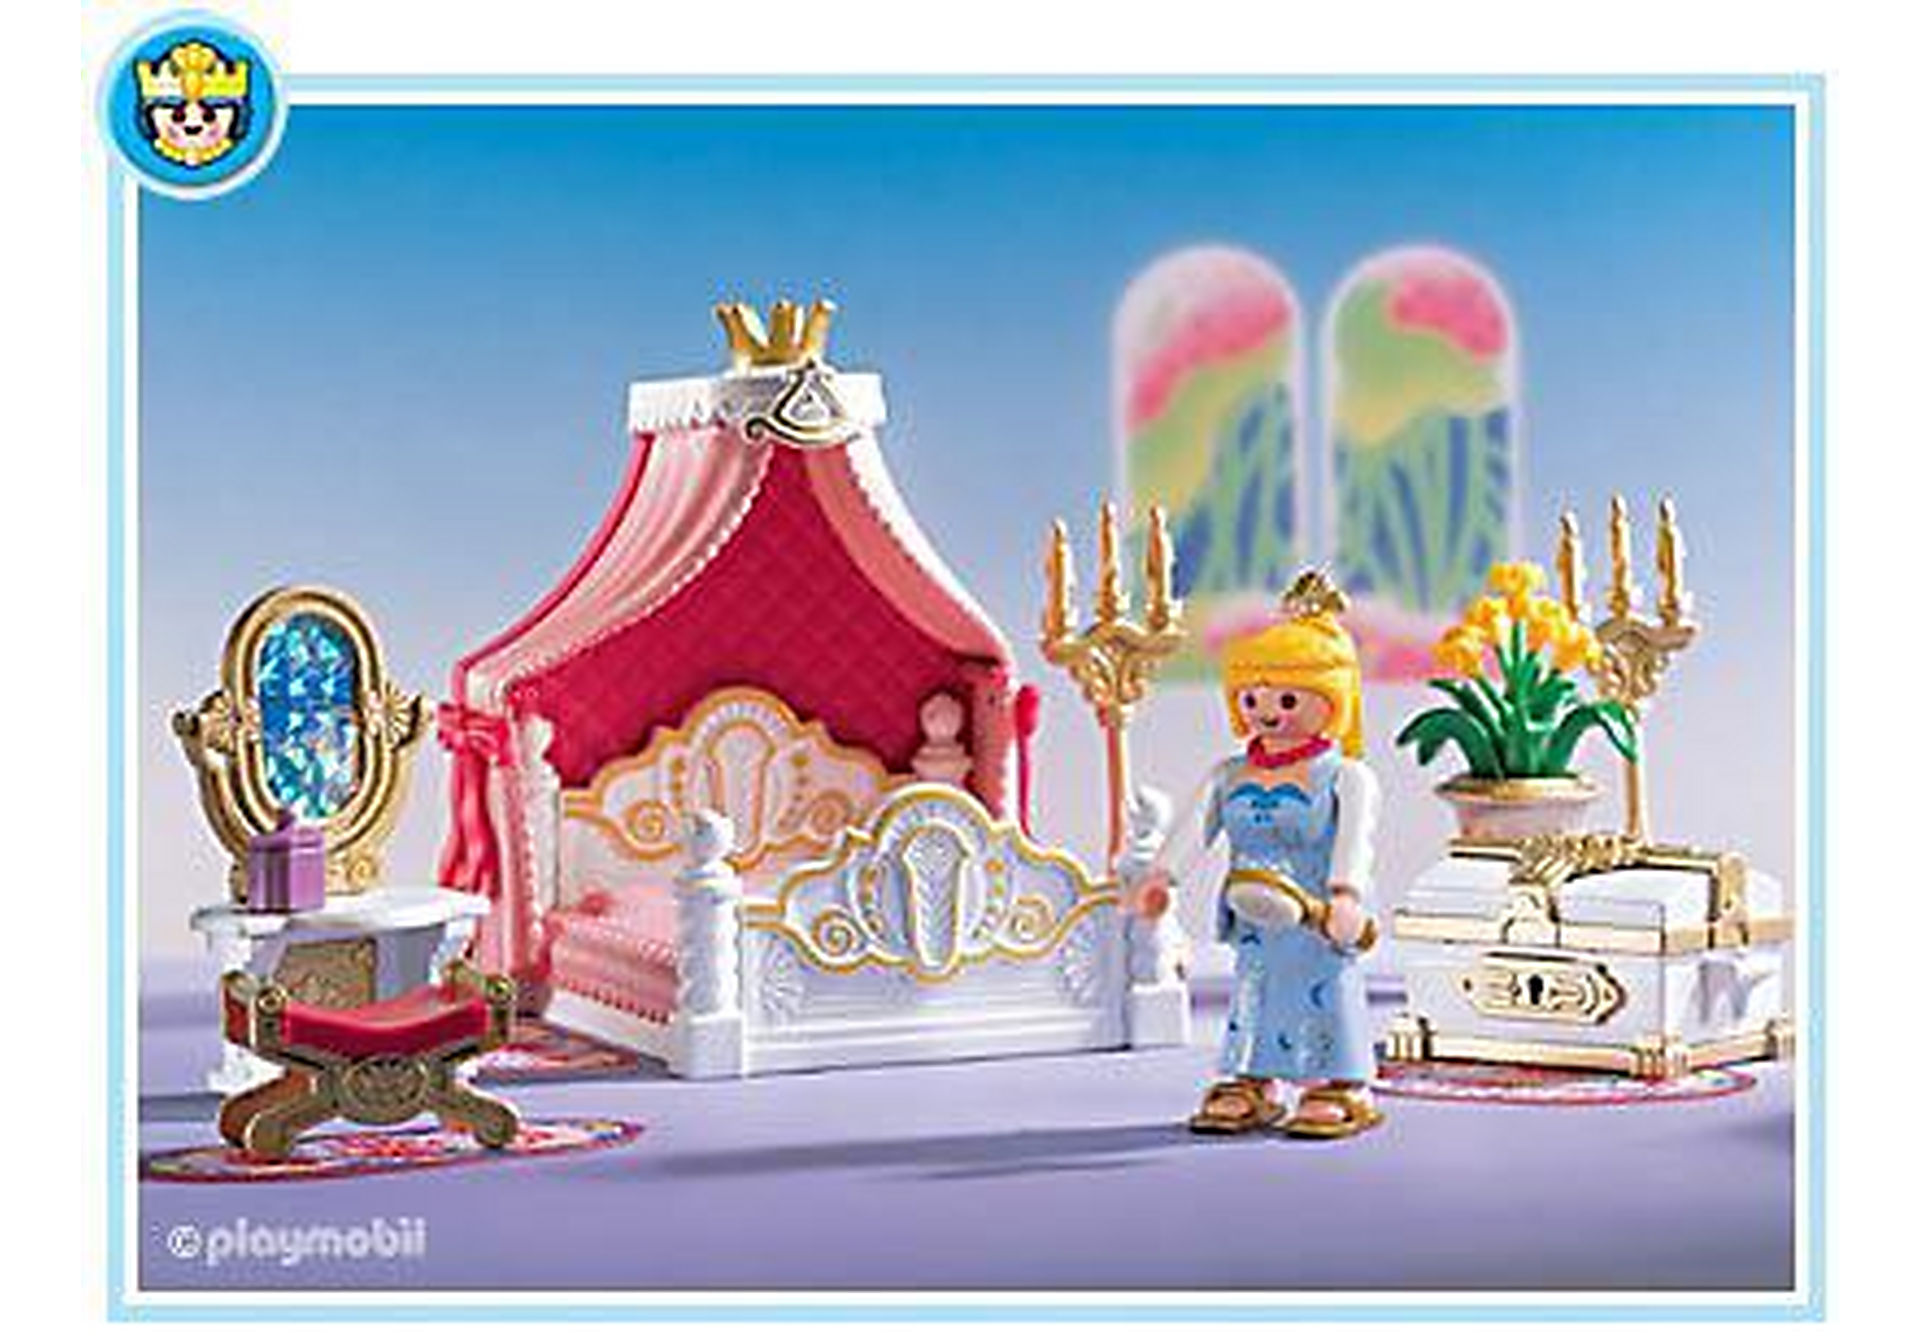 3020-A Chambre de la princesse zoom image1